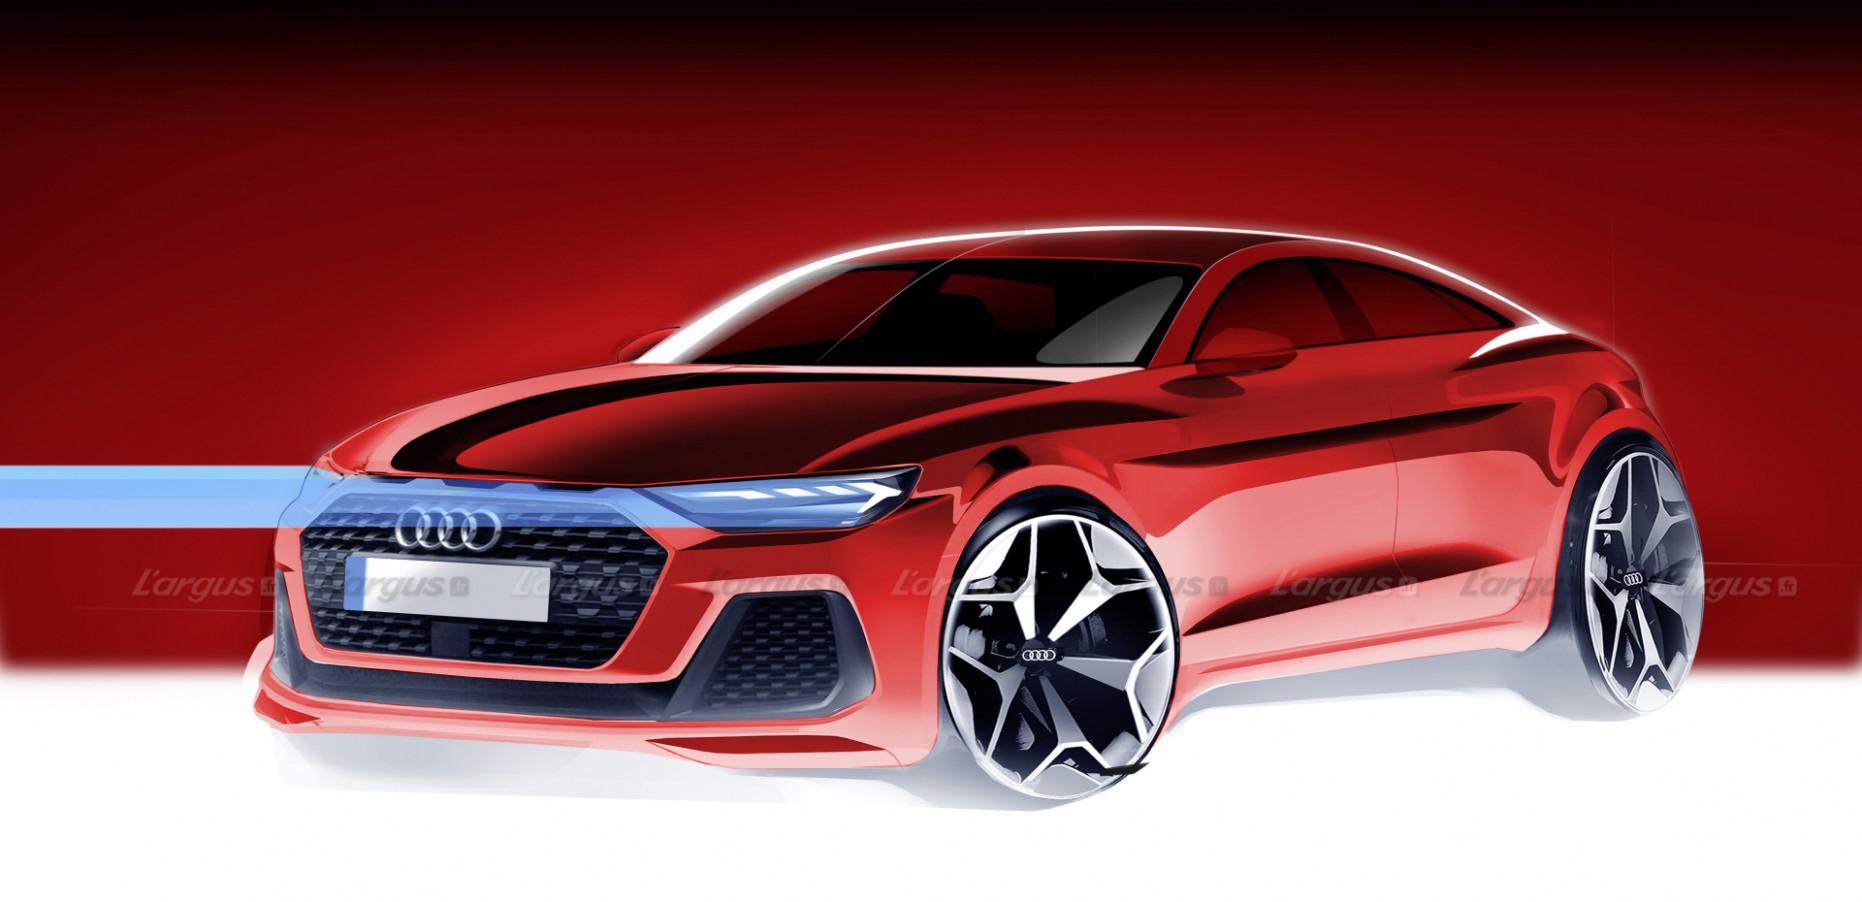 Spesification 2022 Audi TTS